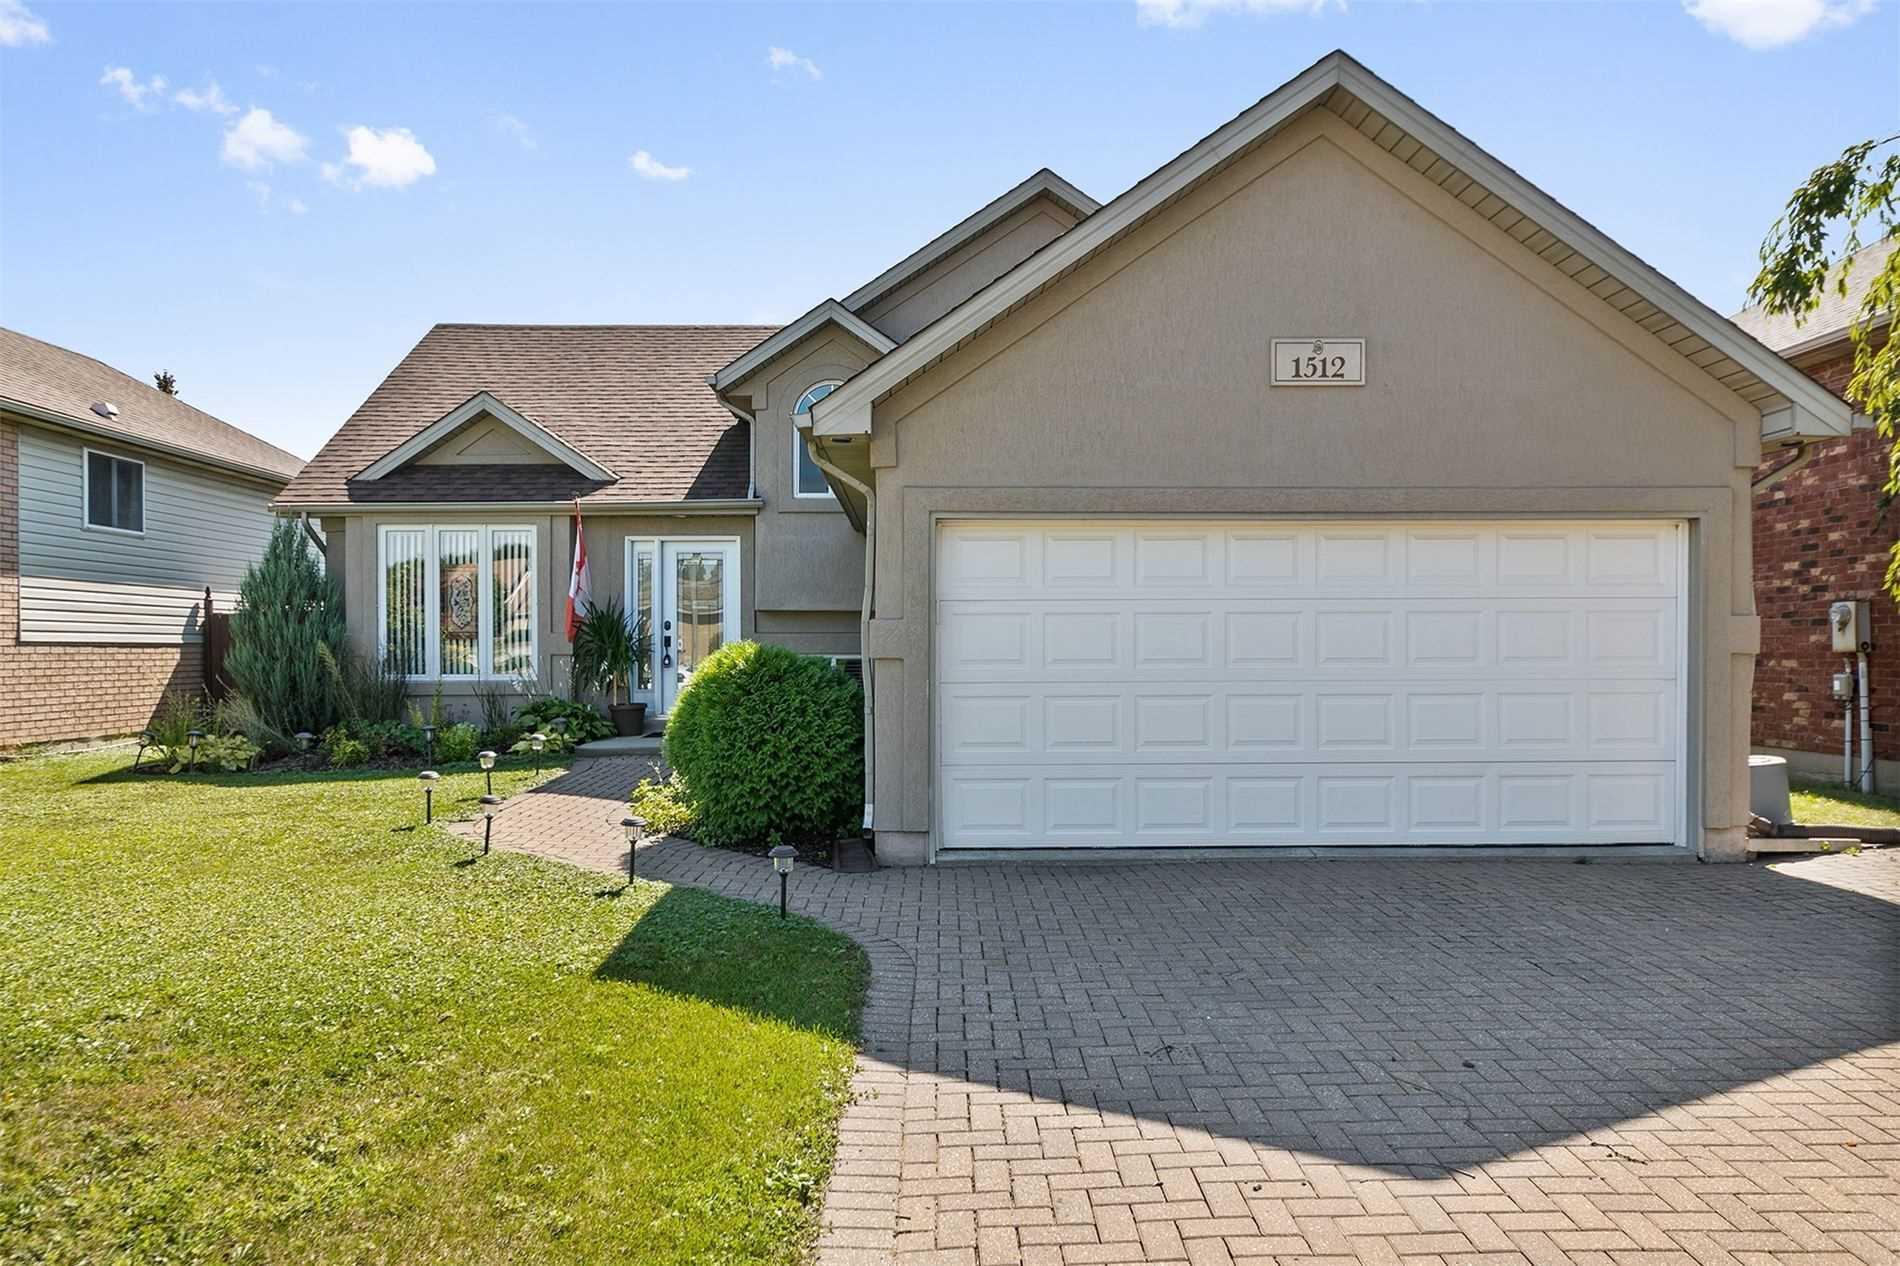 1512 Imperial Cres, Windsor, Ontario N9G2T8, 3 Bedrooms Bedrooms, ,2 BathroomsBathrooms,Detached,For Sale,Imperial,X5368482